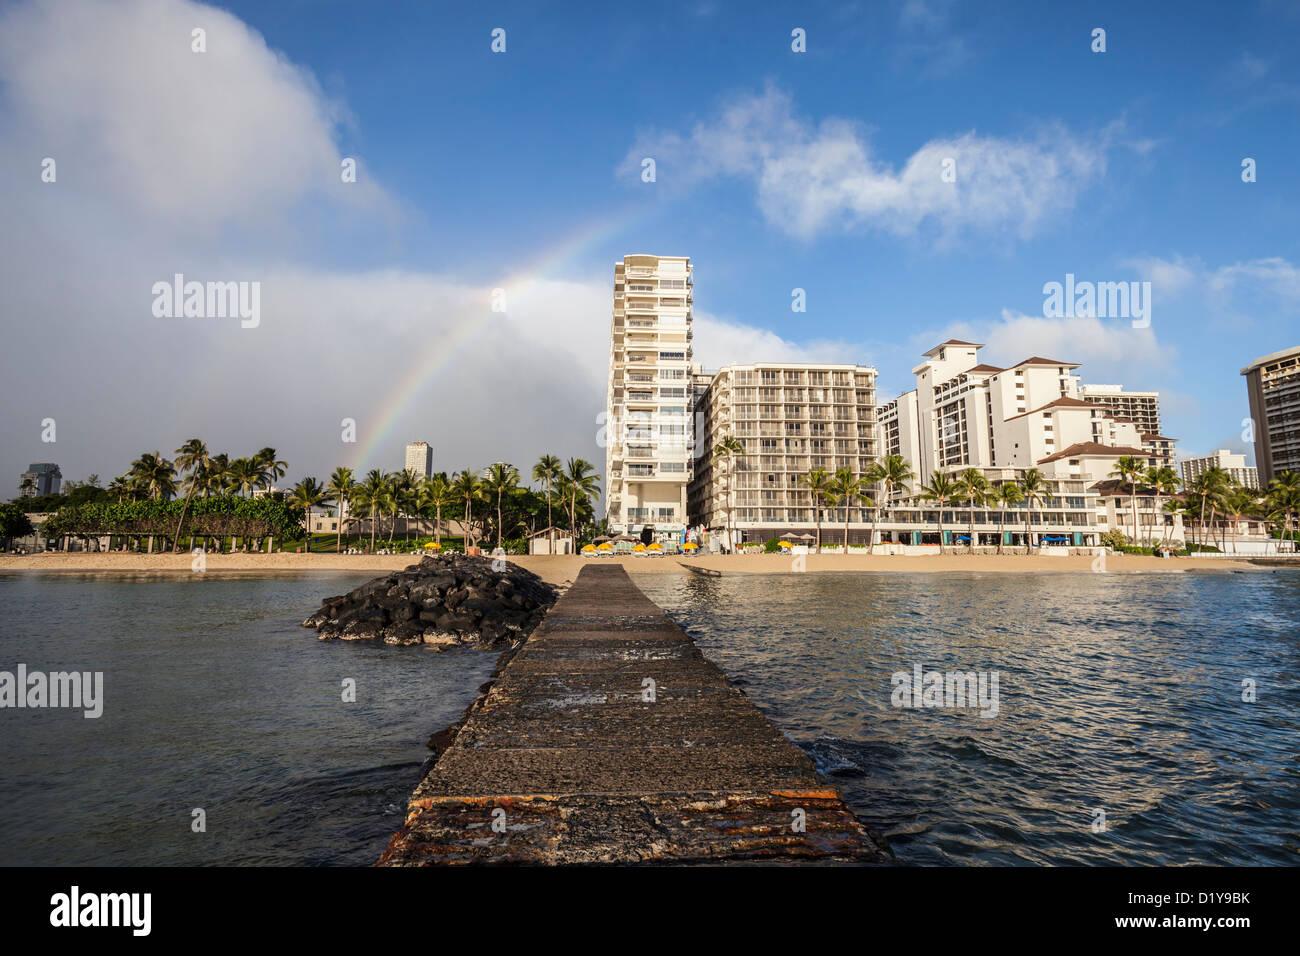 Rainbow above Waikiki high rise towers. - Stock Image